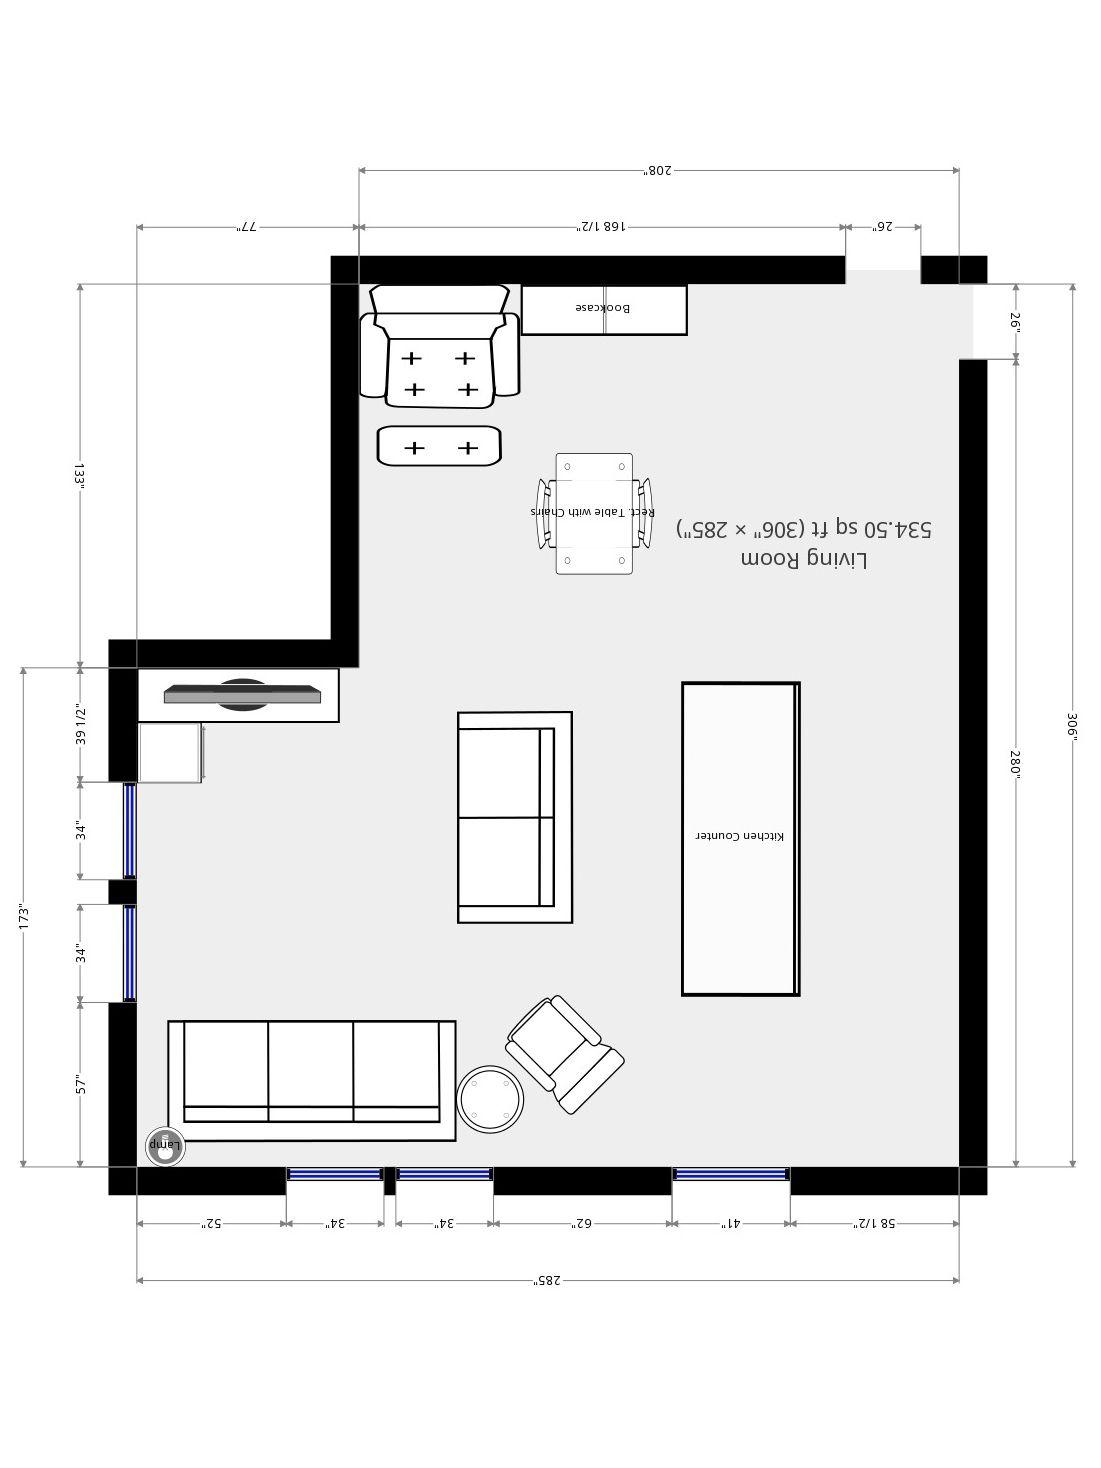 Plan 1 - Ground Floor-01-01.jpeg